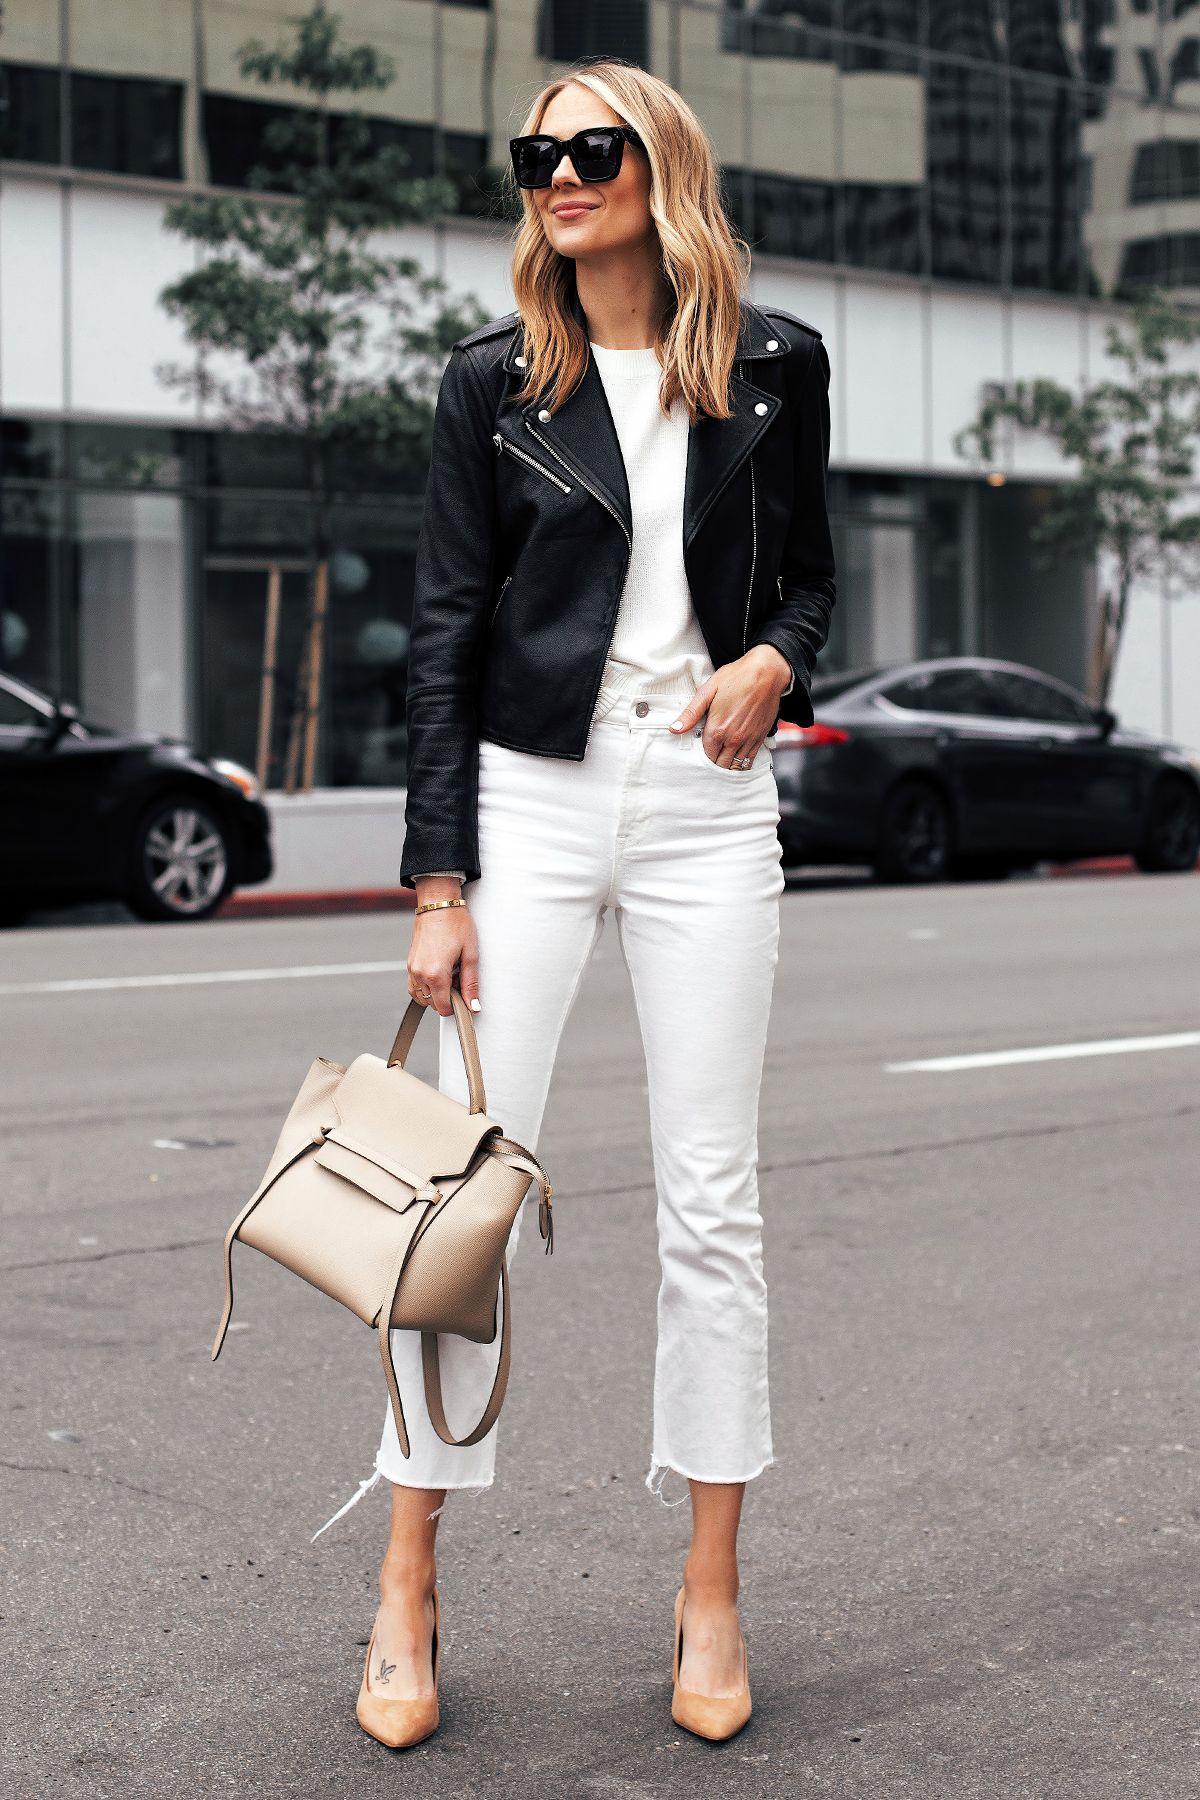 2427e28c0a6 Fashion Jackson Capsule Wardrobe Wearing Club Monaco Black Leather Jacket  White Sweater Everlane White Cropped Jeans